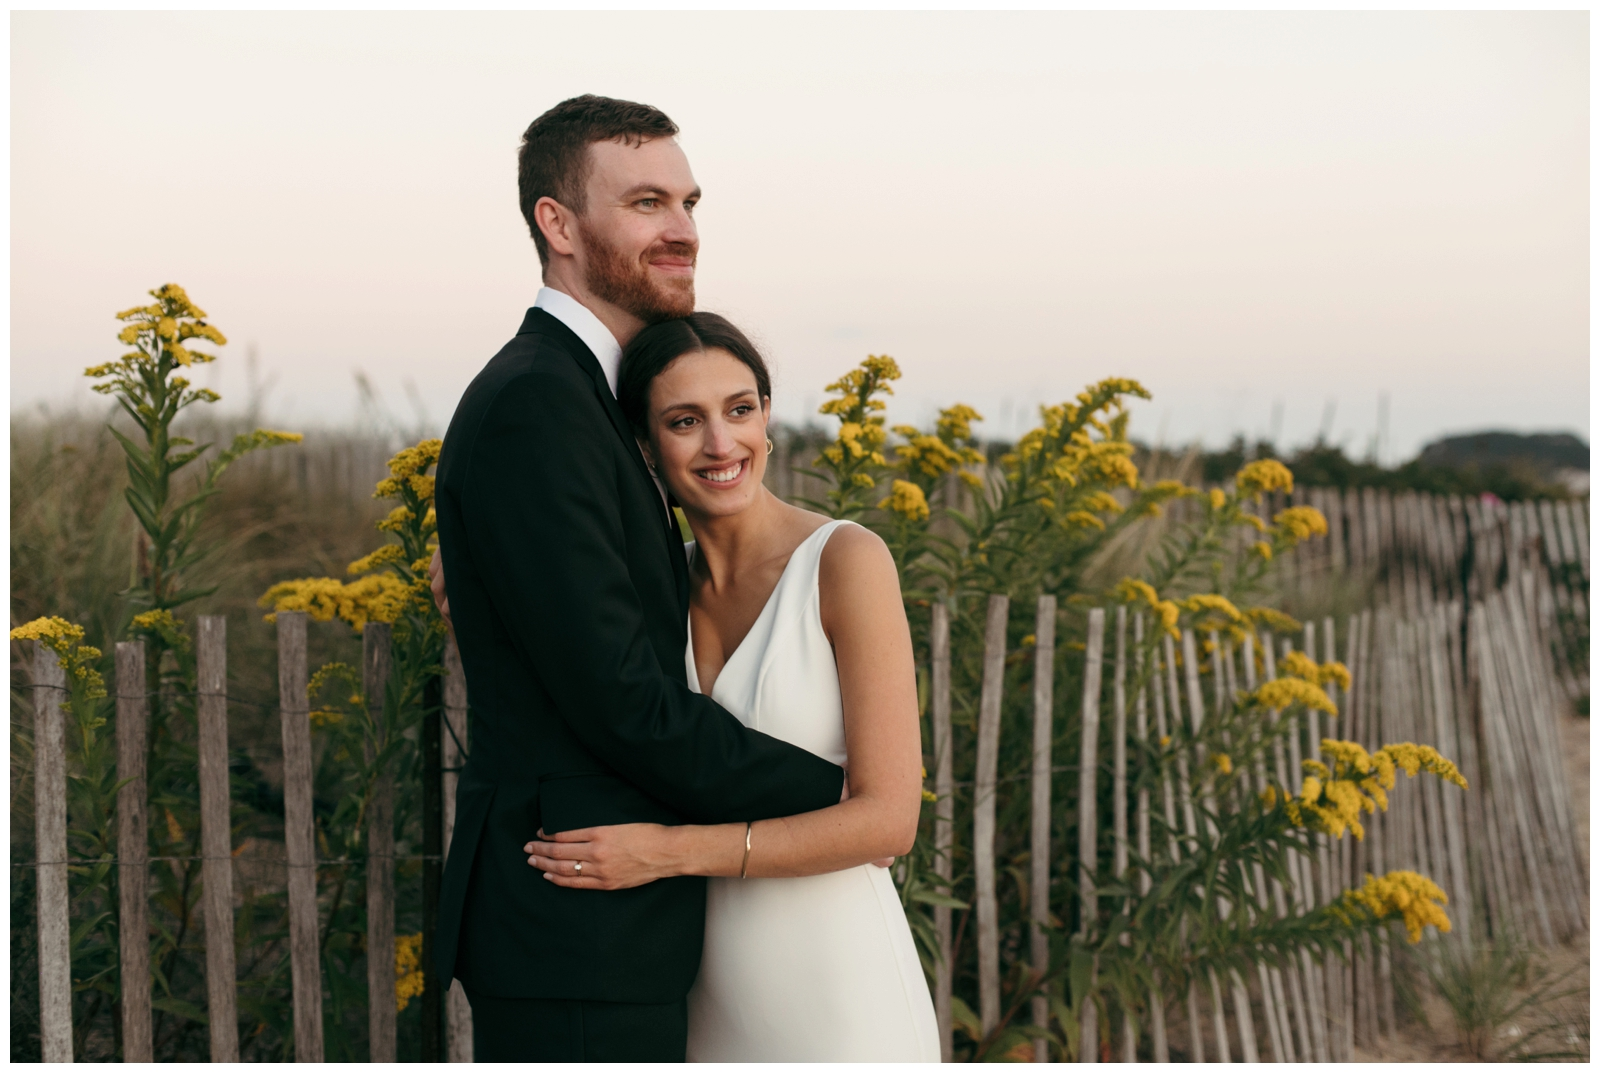 Madison-Beach-Hotel-Wedding-Bailey-Q-Photo-Boston-Wedding-Photographer-050.jpg